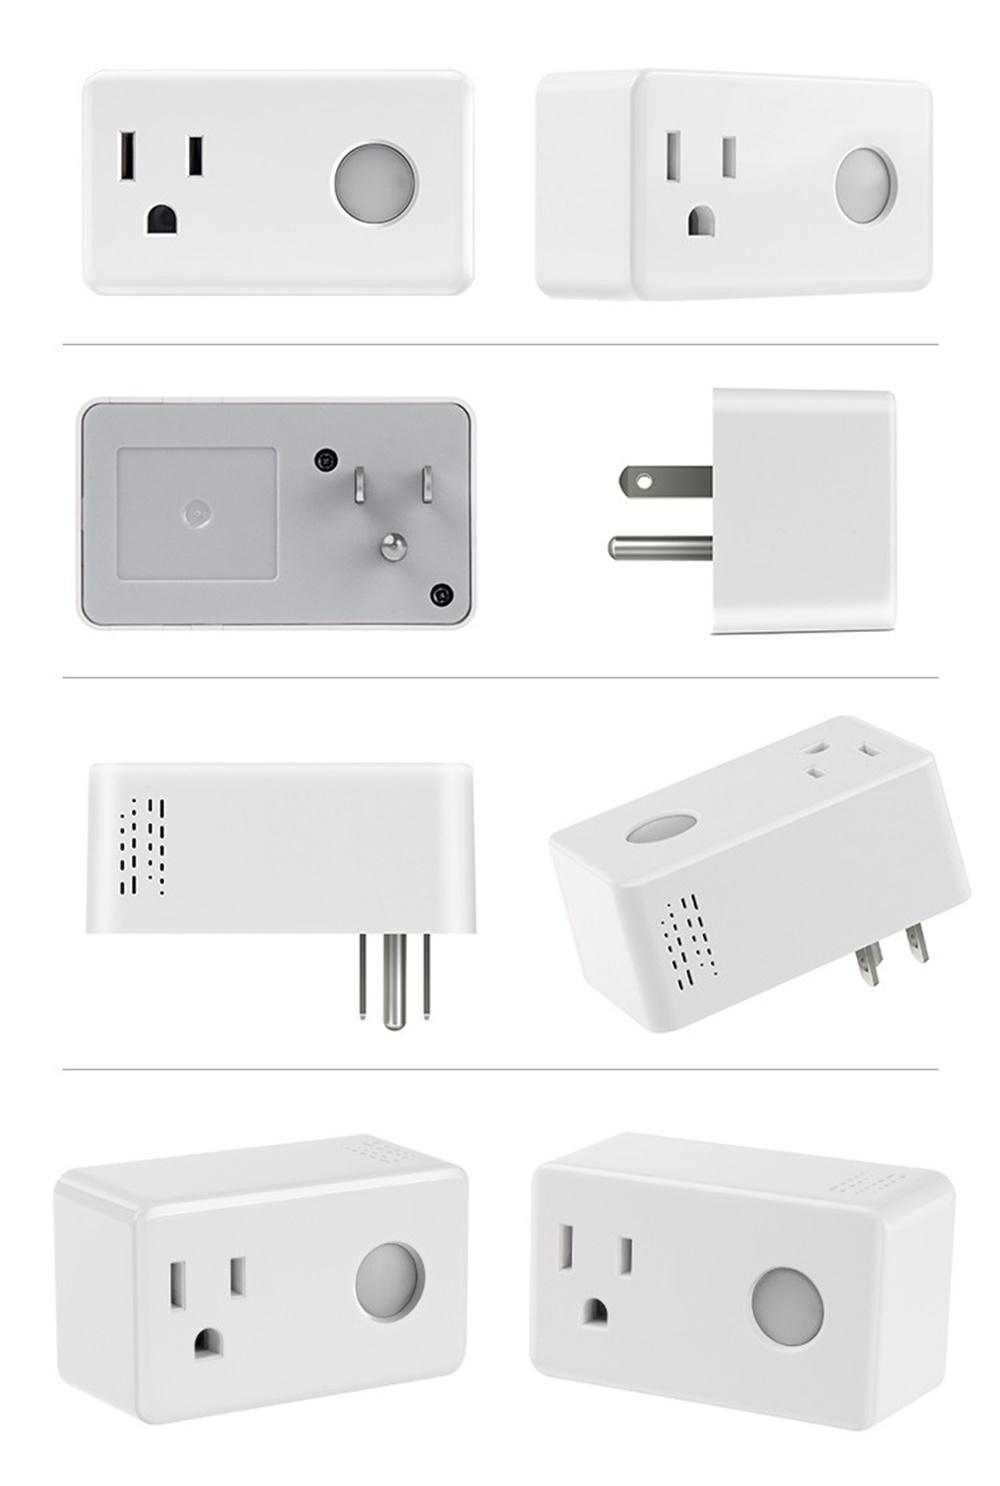 broadlink smart socket price